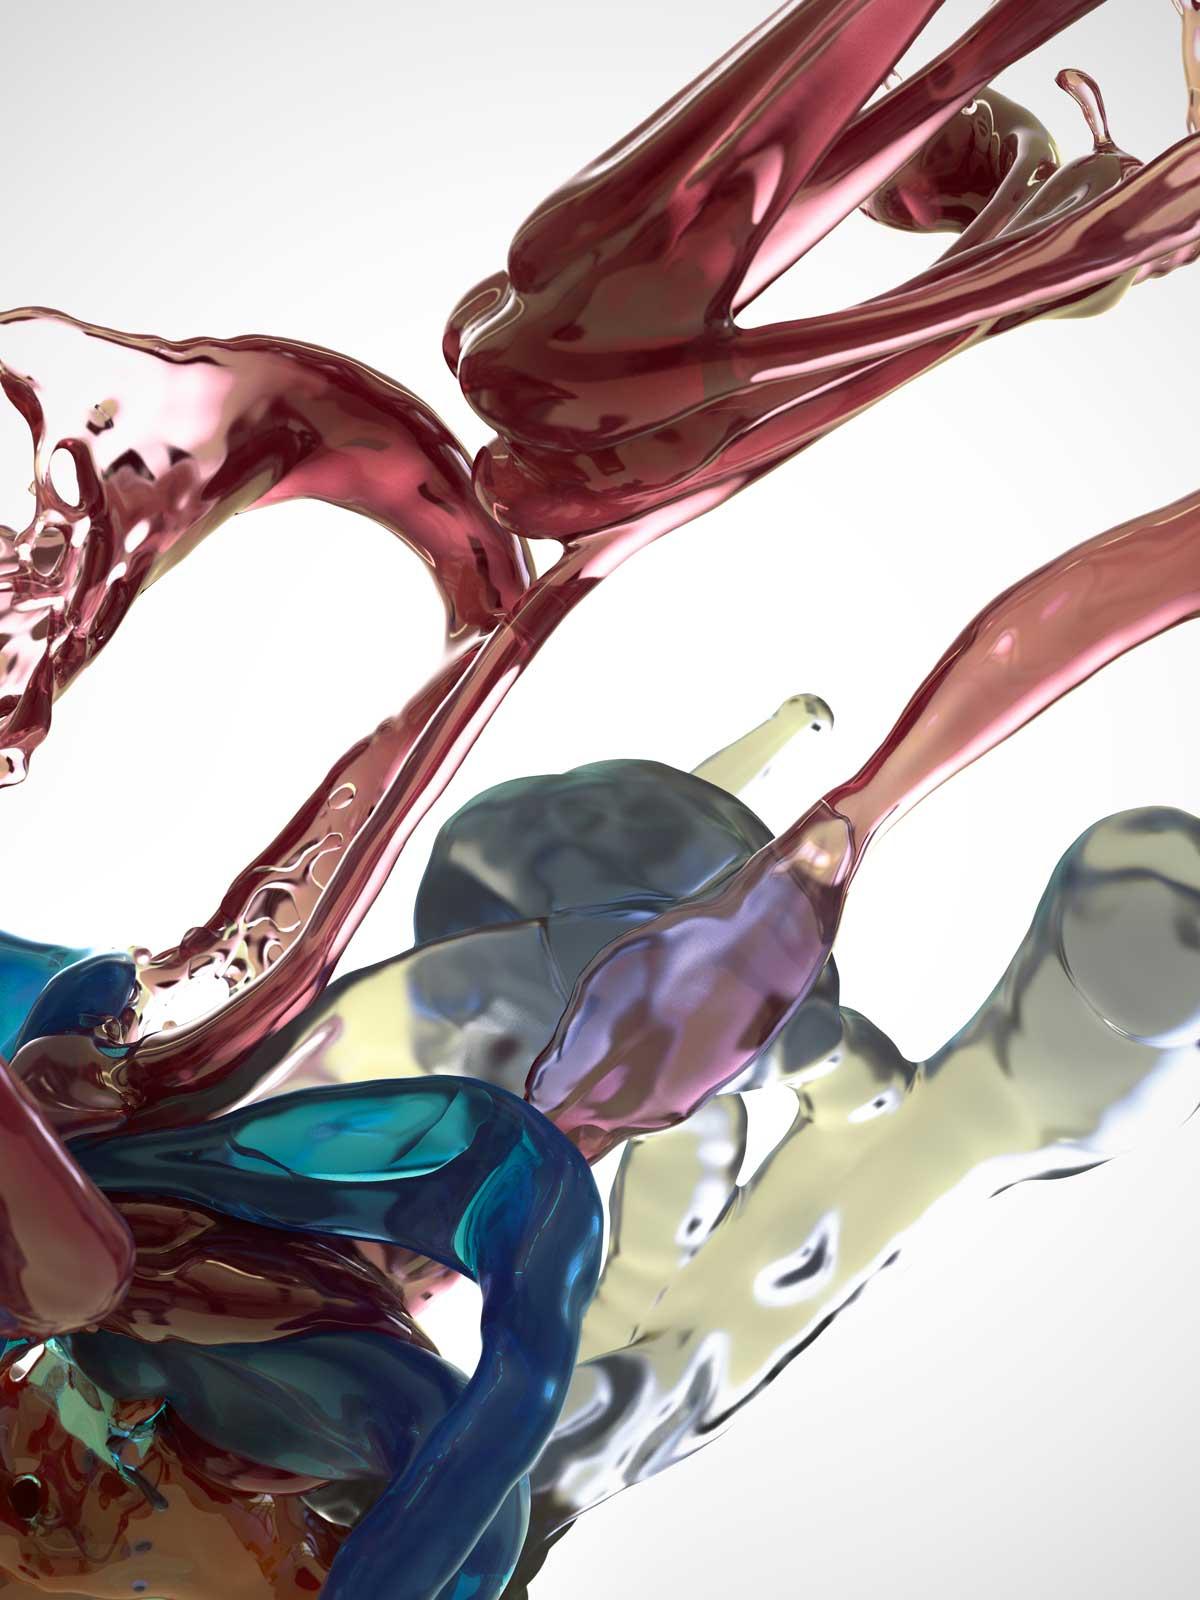 Bodypaint III 12, CGI Fine Art Print, 140 x 105 cm, 2016